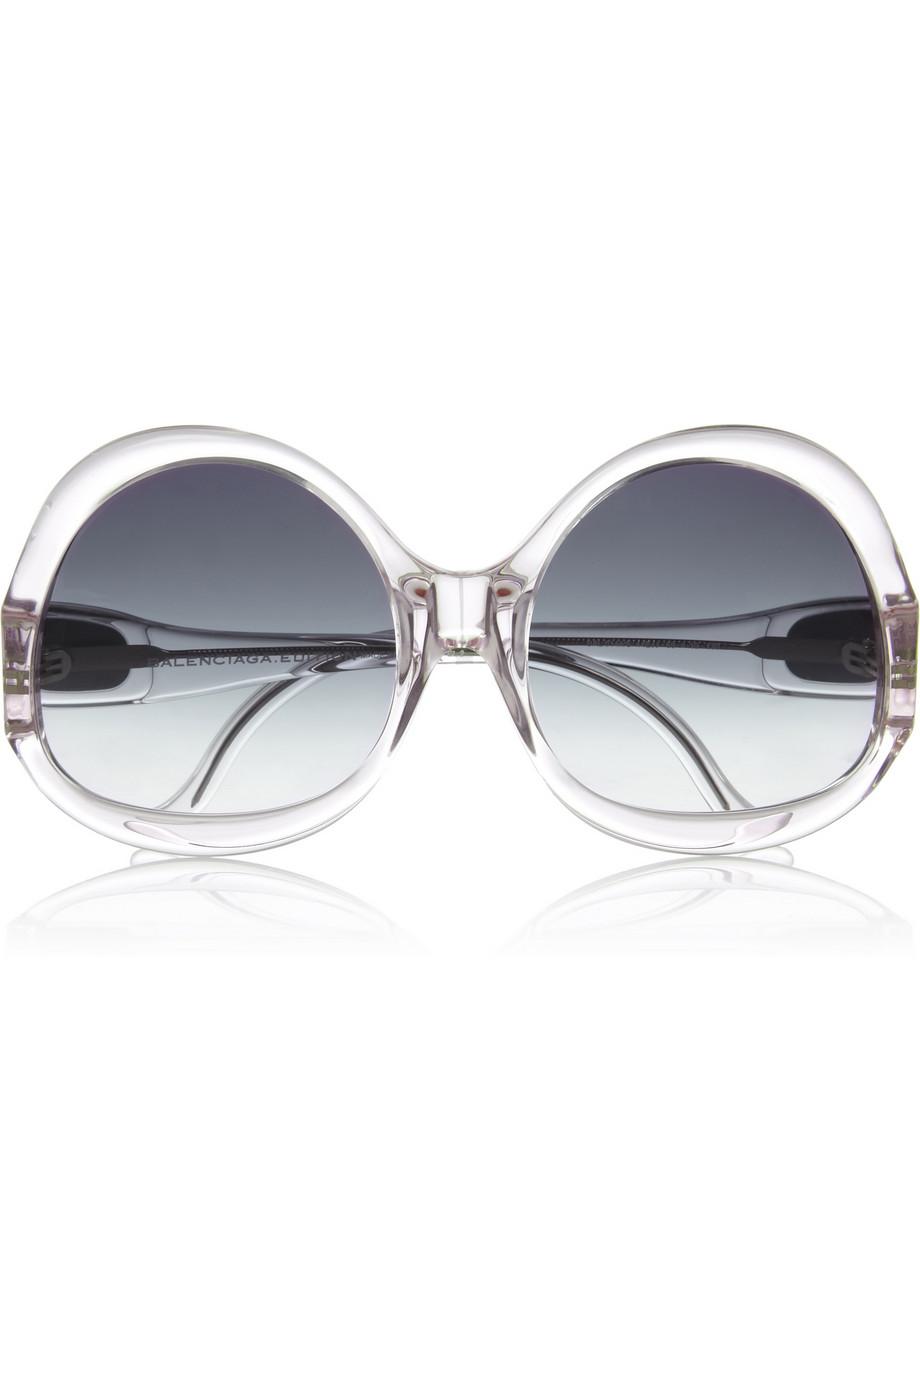 Balenciaga Oversized Round Frame Acetate Sunglasses $120 THEOUTNET.COM